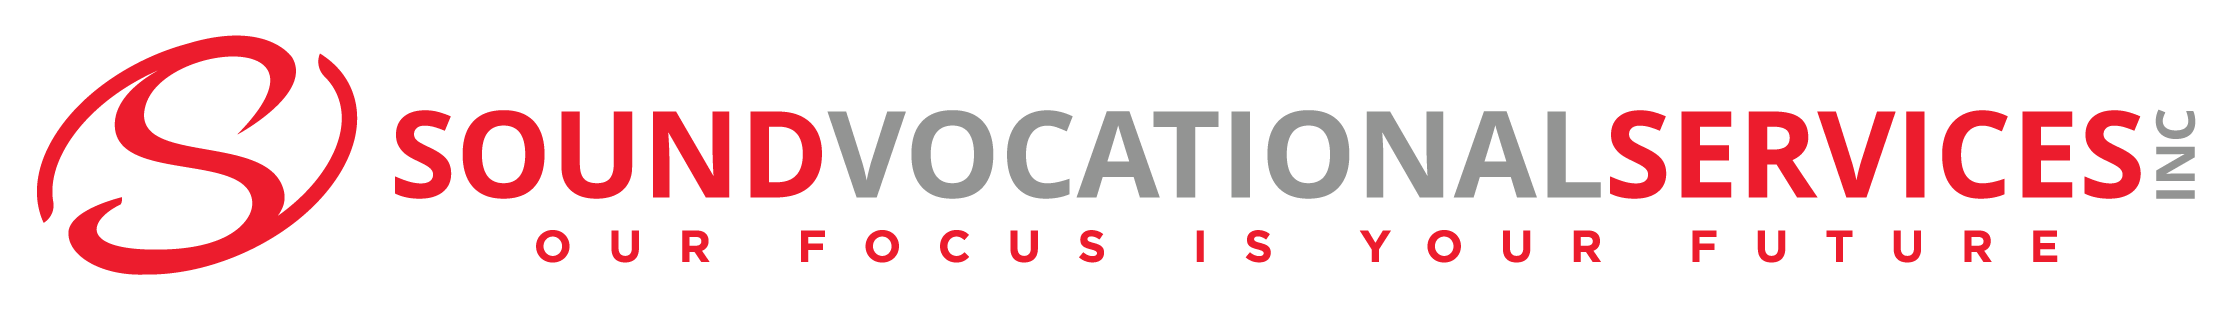 Sound Vocational Services, Inc.